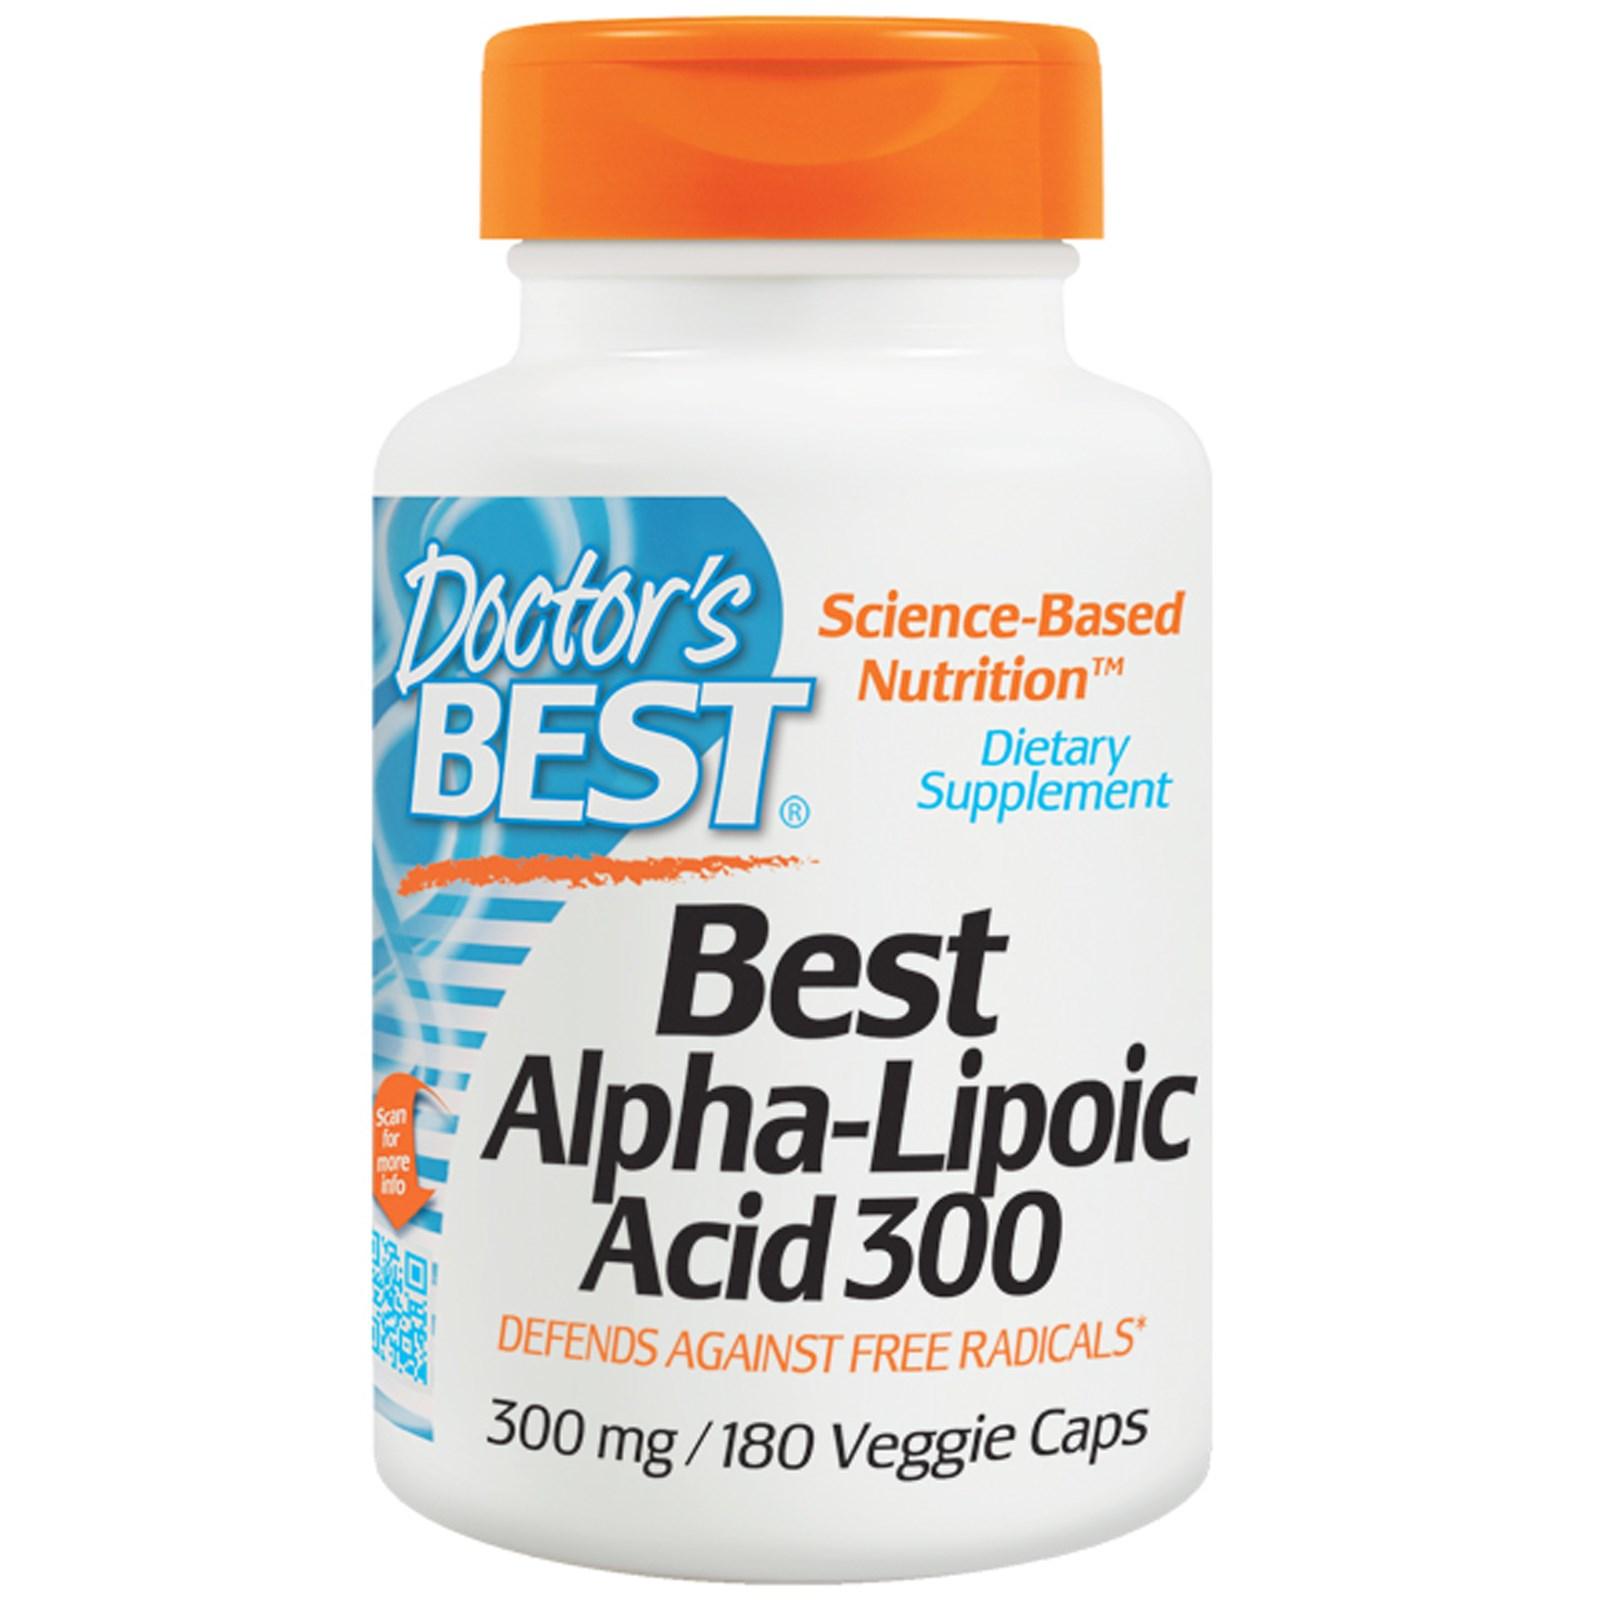 Image of Doctor's Best, Best Alpha-Lipoic Acid 300, 300 mg, 180 Veggie Caps 0753950002777